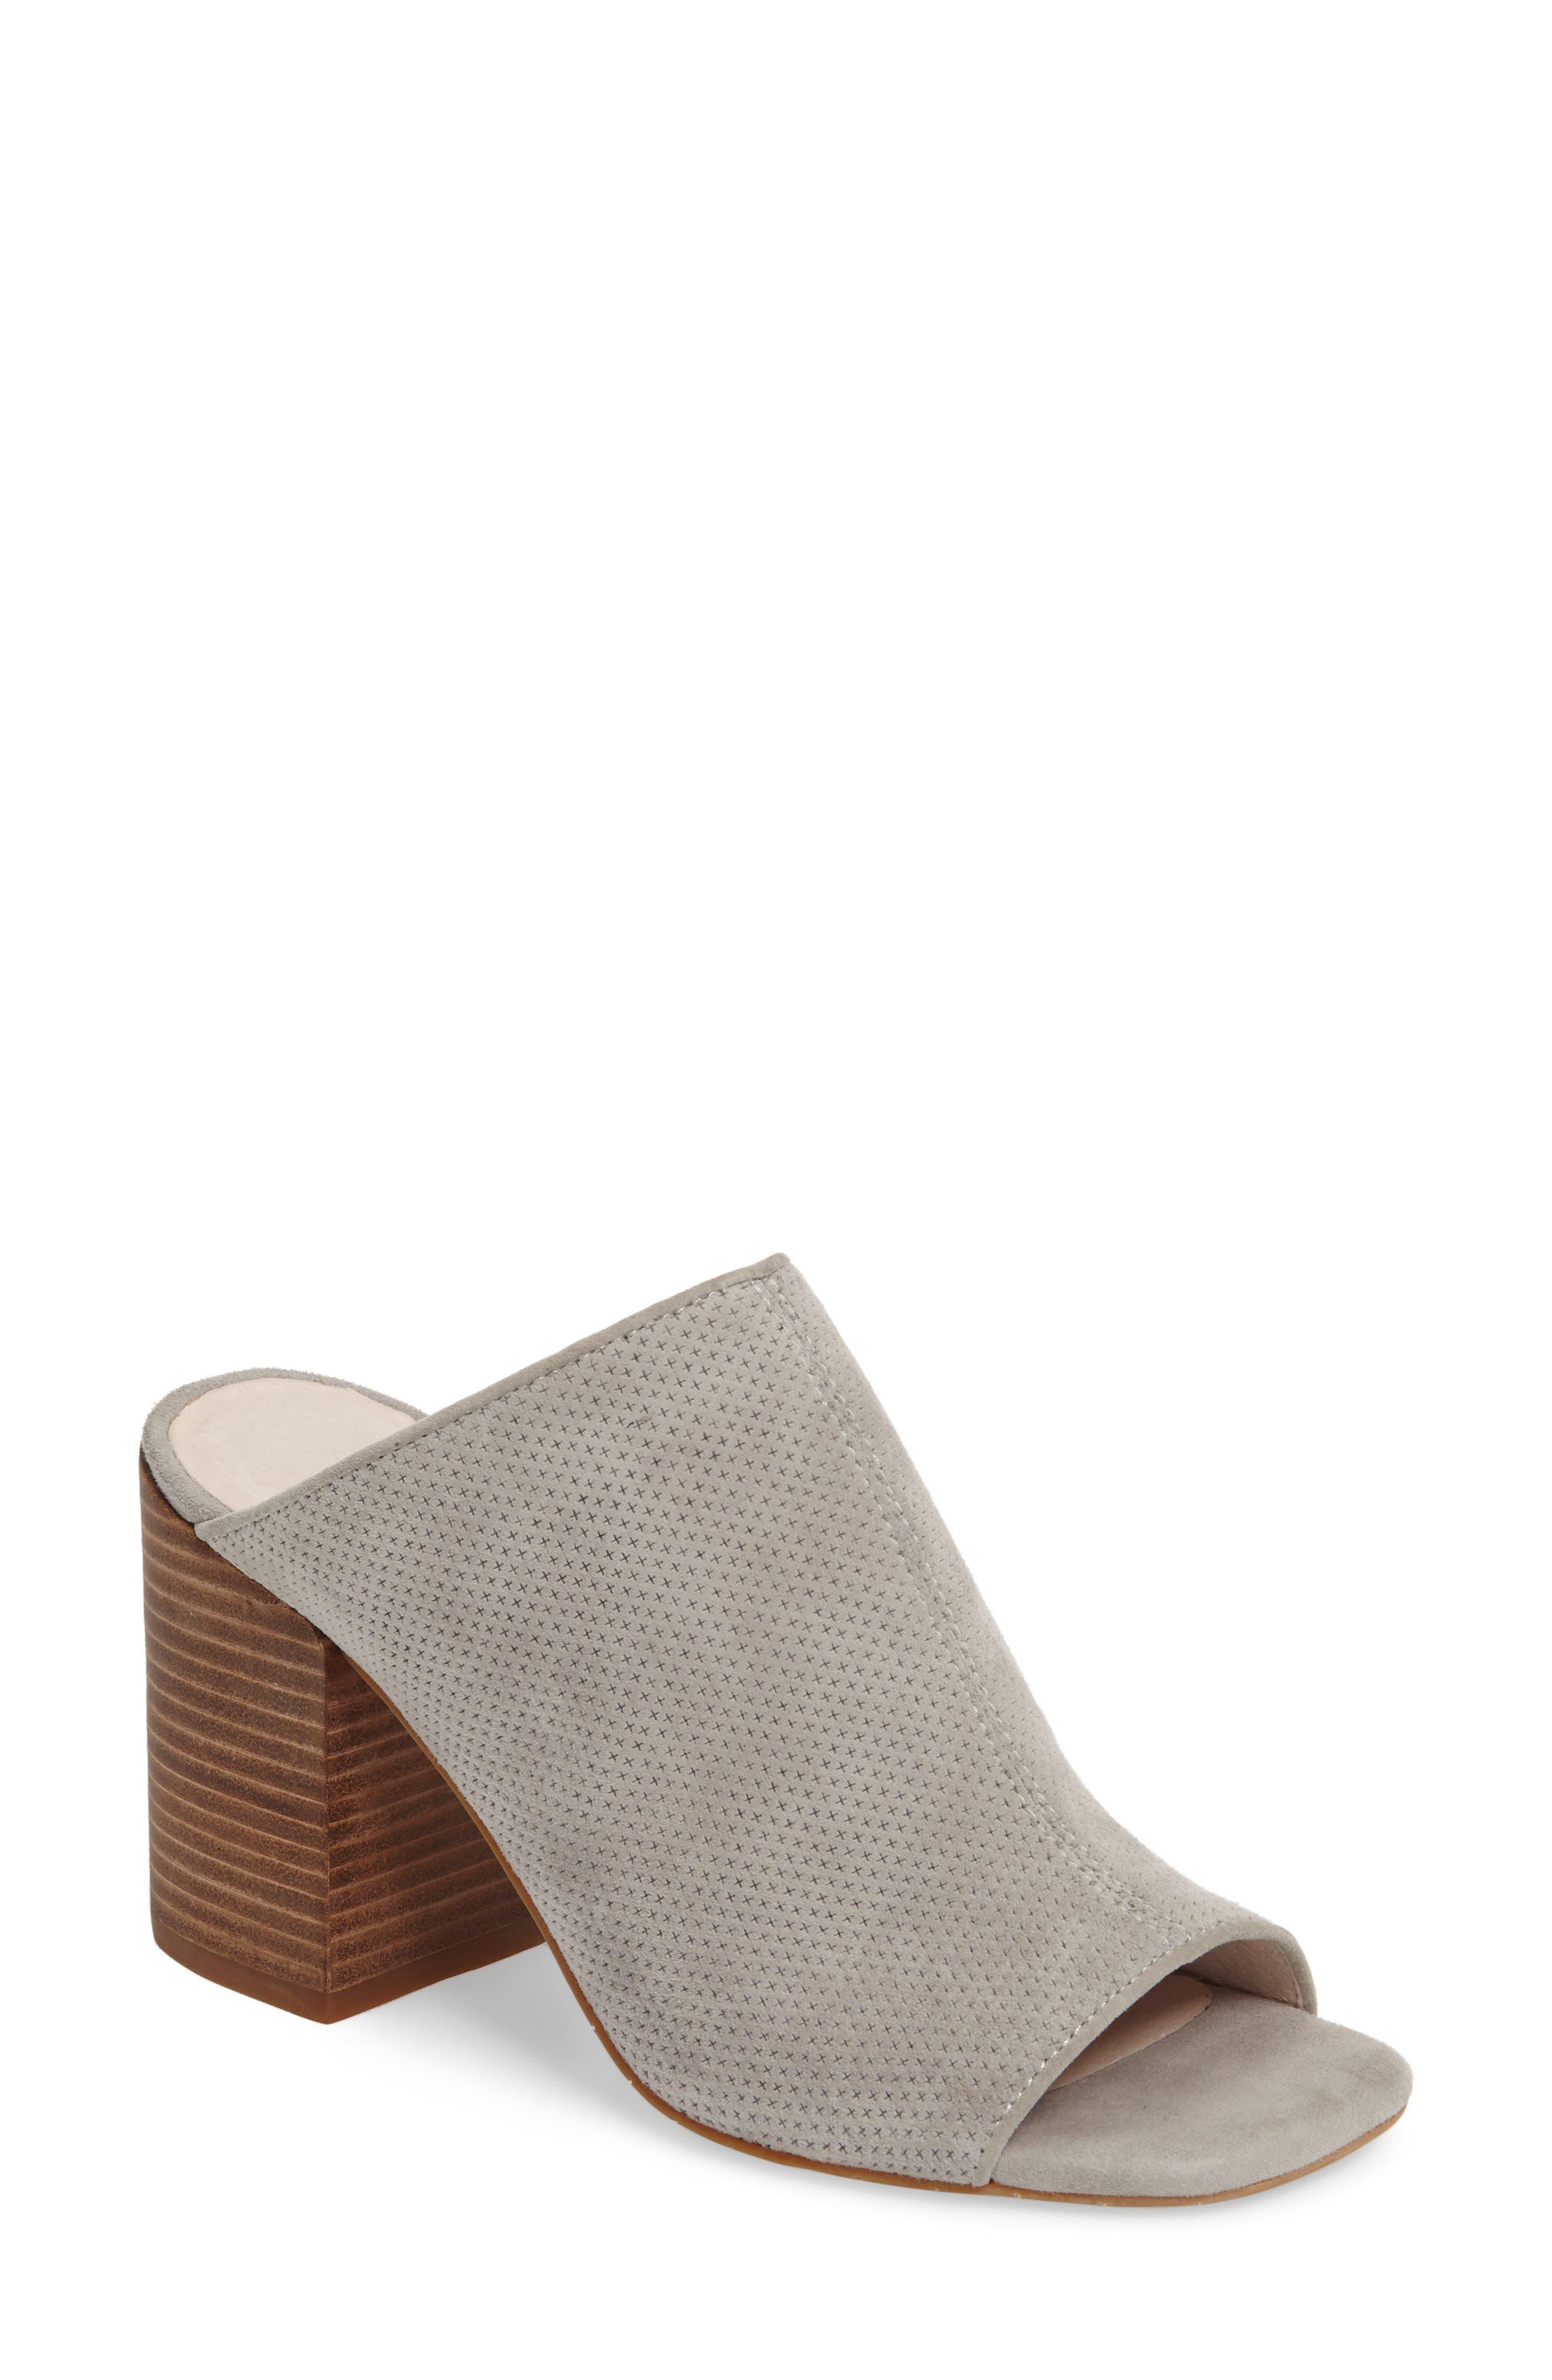 Kenneth Cole New York Karolina Perforated Mule (Women)